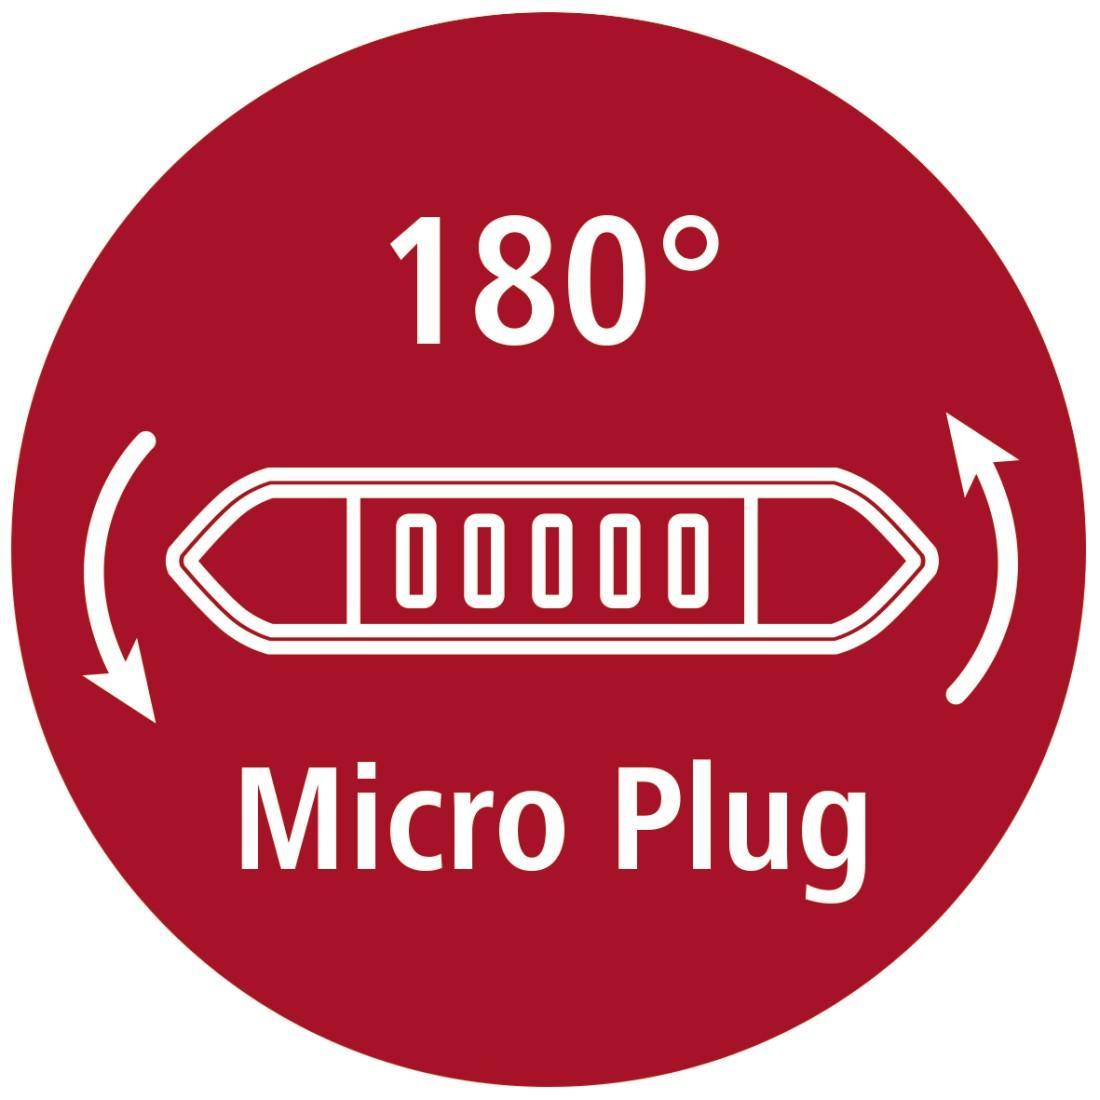 Кабел HAMA Flexi-Slim 135701 Micro USB, 0.75 м., Позлатени конектори, Син